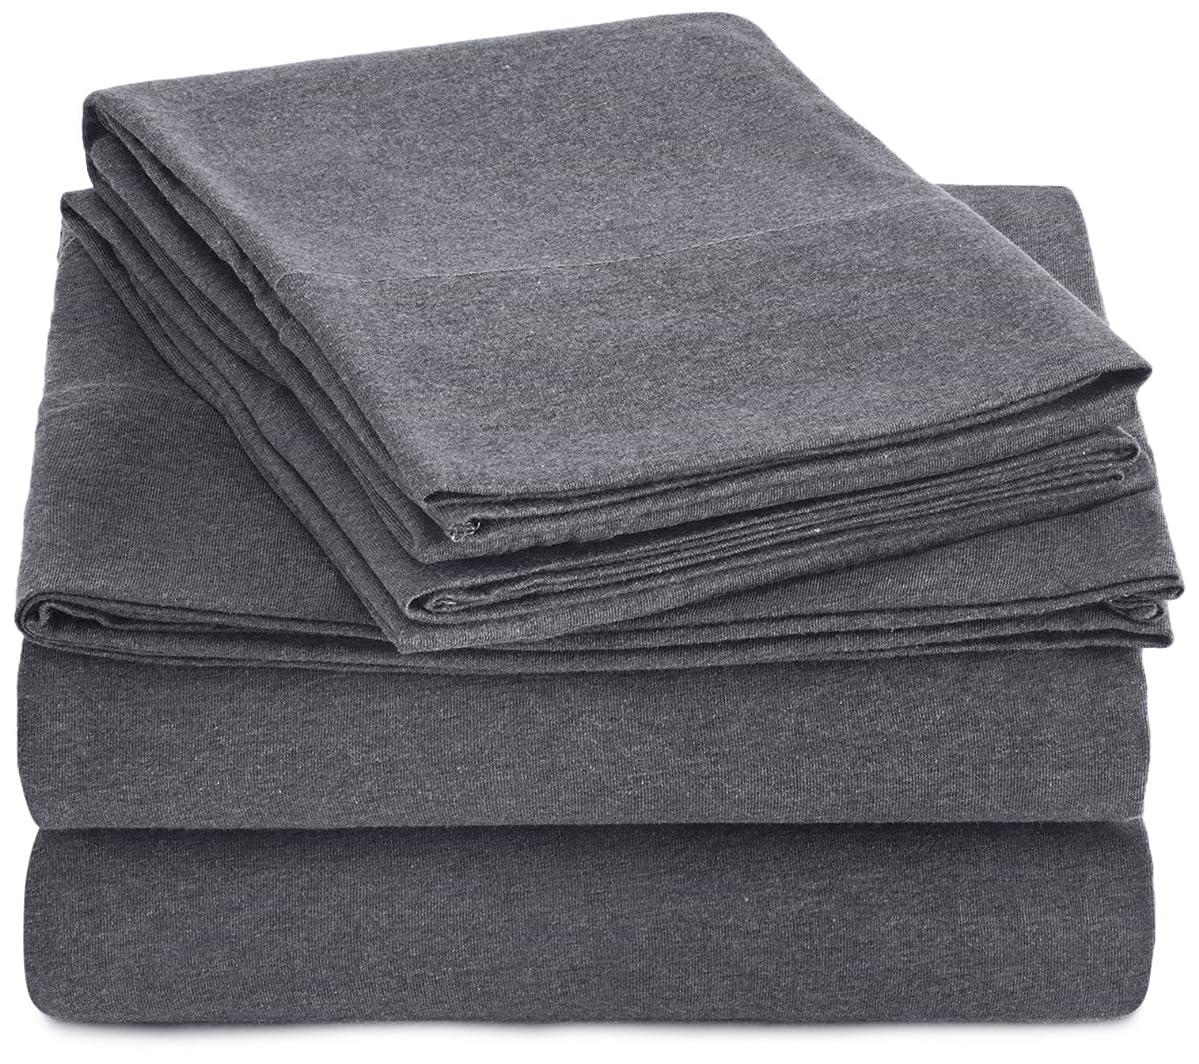 AmazonBasics Heather Jersey Sheet Set - Full, Dark Gray